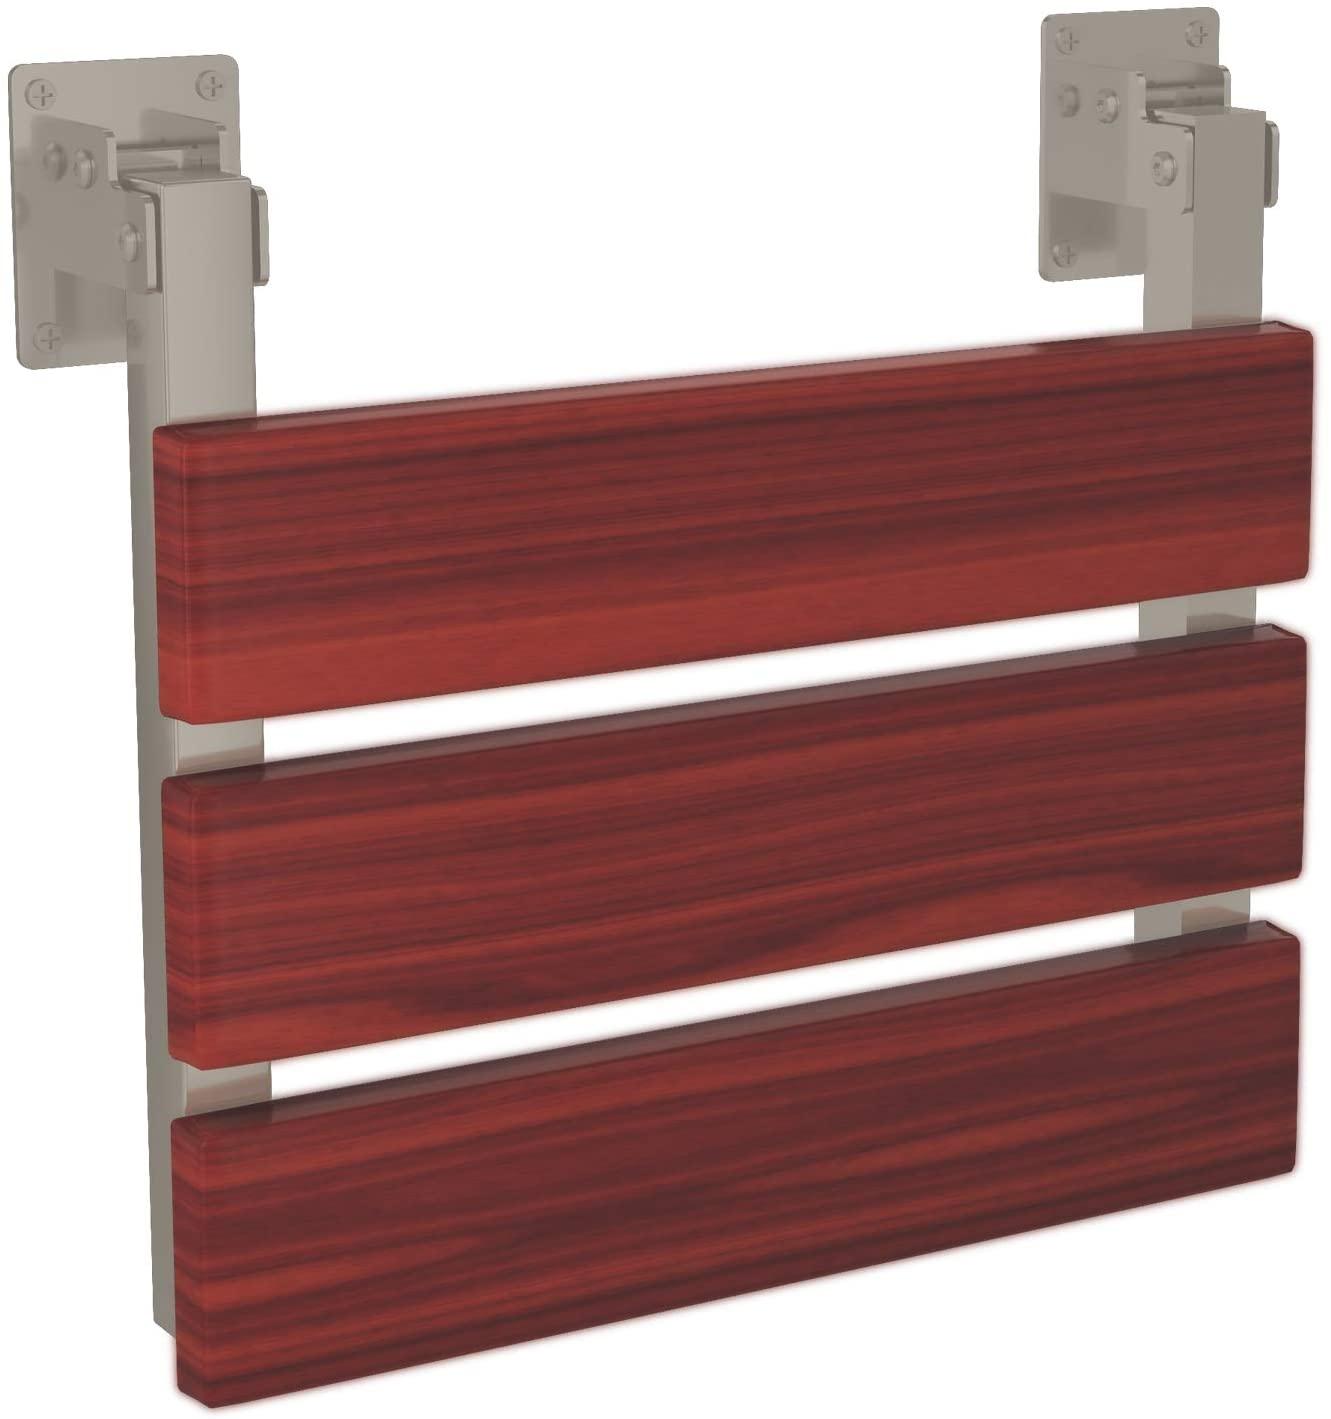 PULSE Showerspas 4008-SSP ErgoSeat II, ADA Compliant Bamboo Shower Seat, Polished Stainless Steel